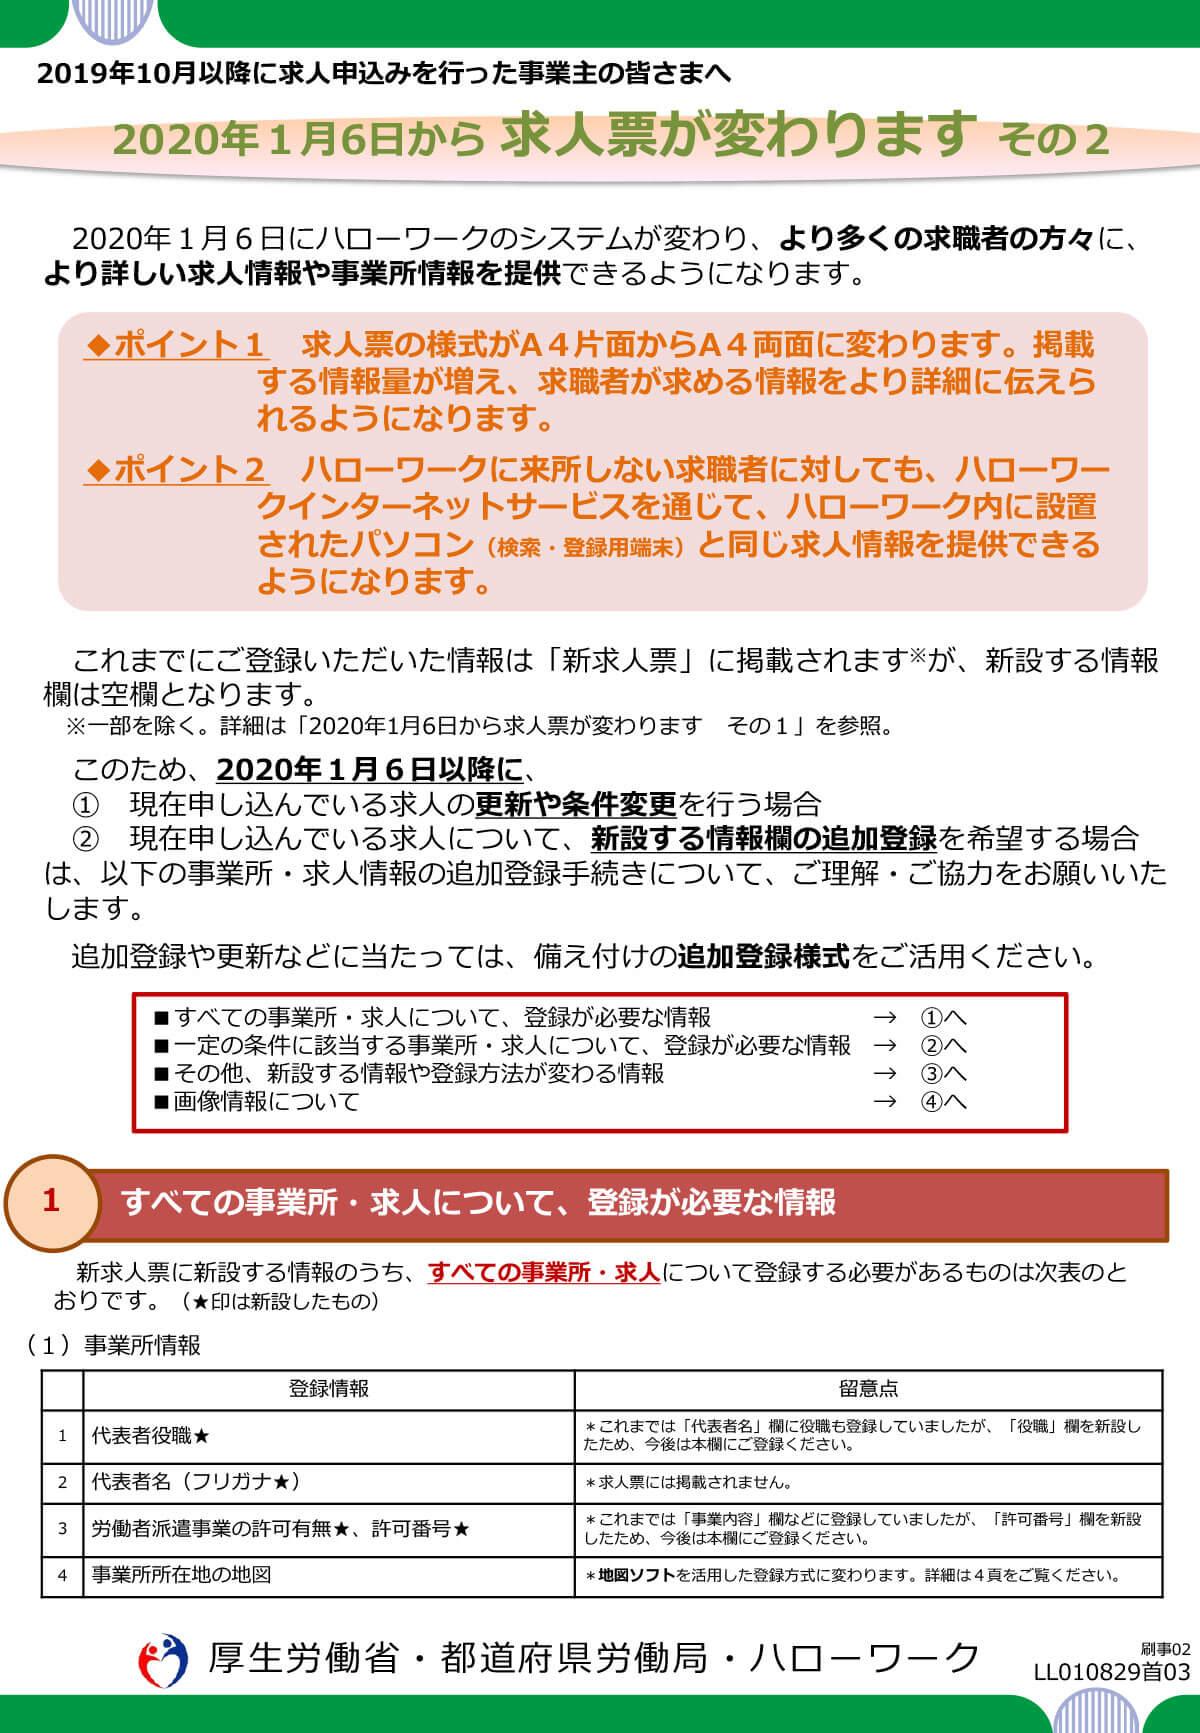 20200106-5-job_posting-2-1